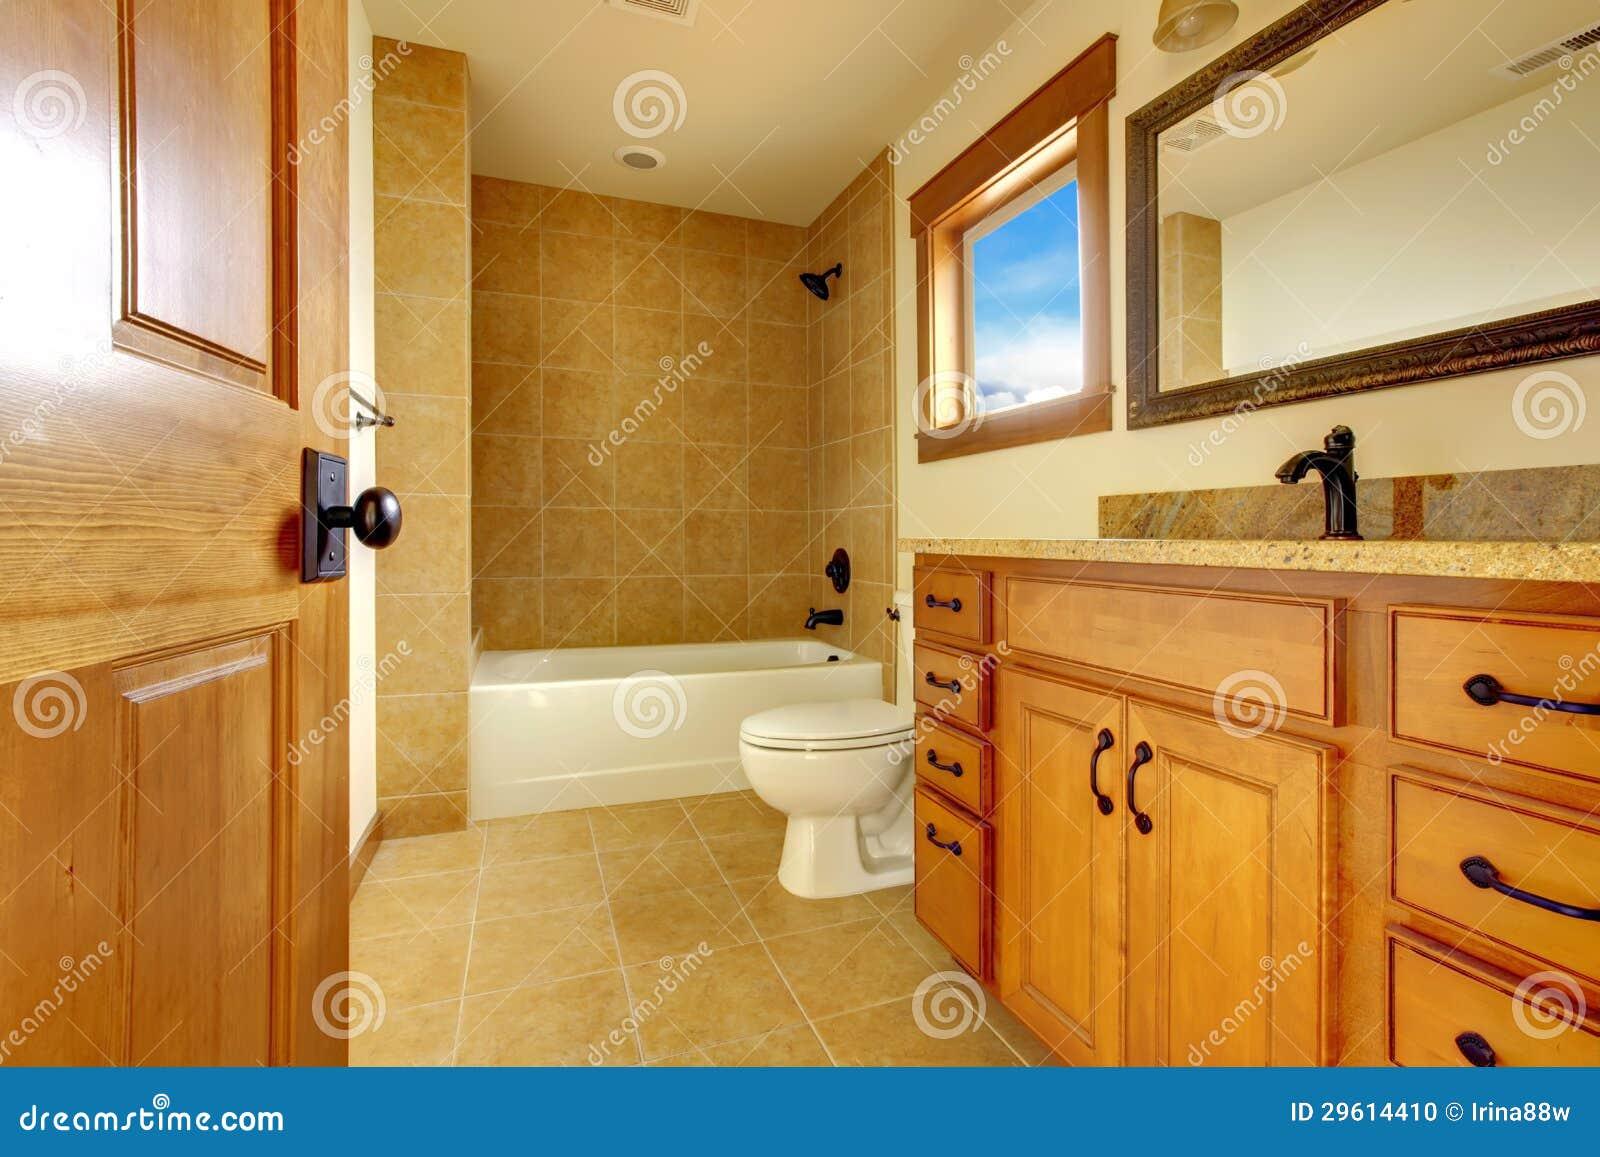 New Modern Beautiful Bathroom In Luxury Home Interior Stock Photo